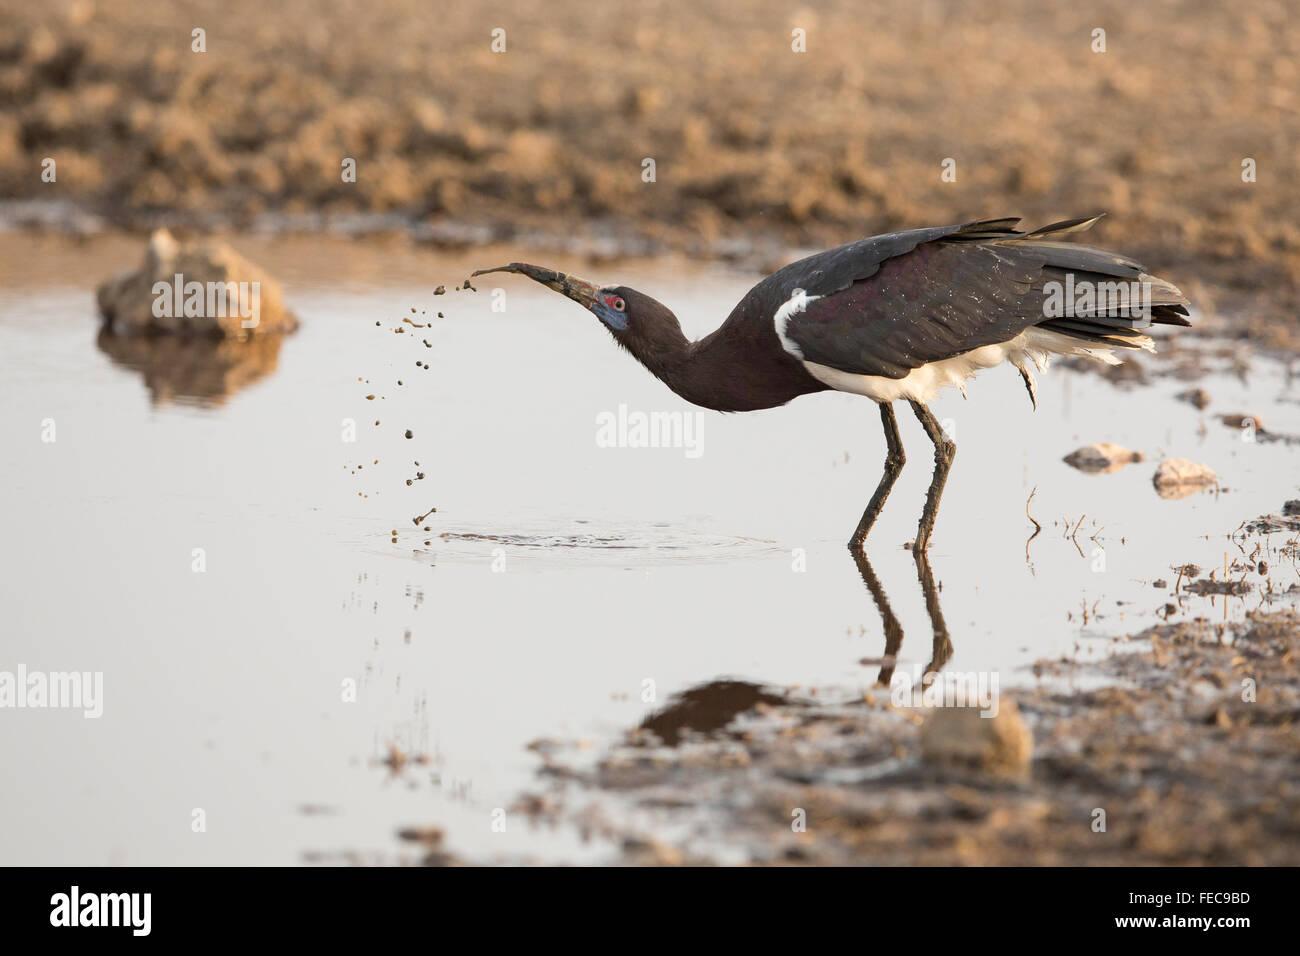 Ein Erwachsener Storch Abdims Trinkwasser im Serengeti Nationalpark in Tansania Stockbild